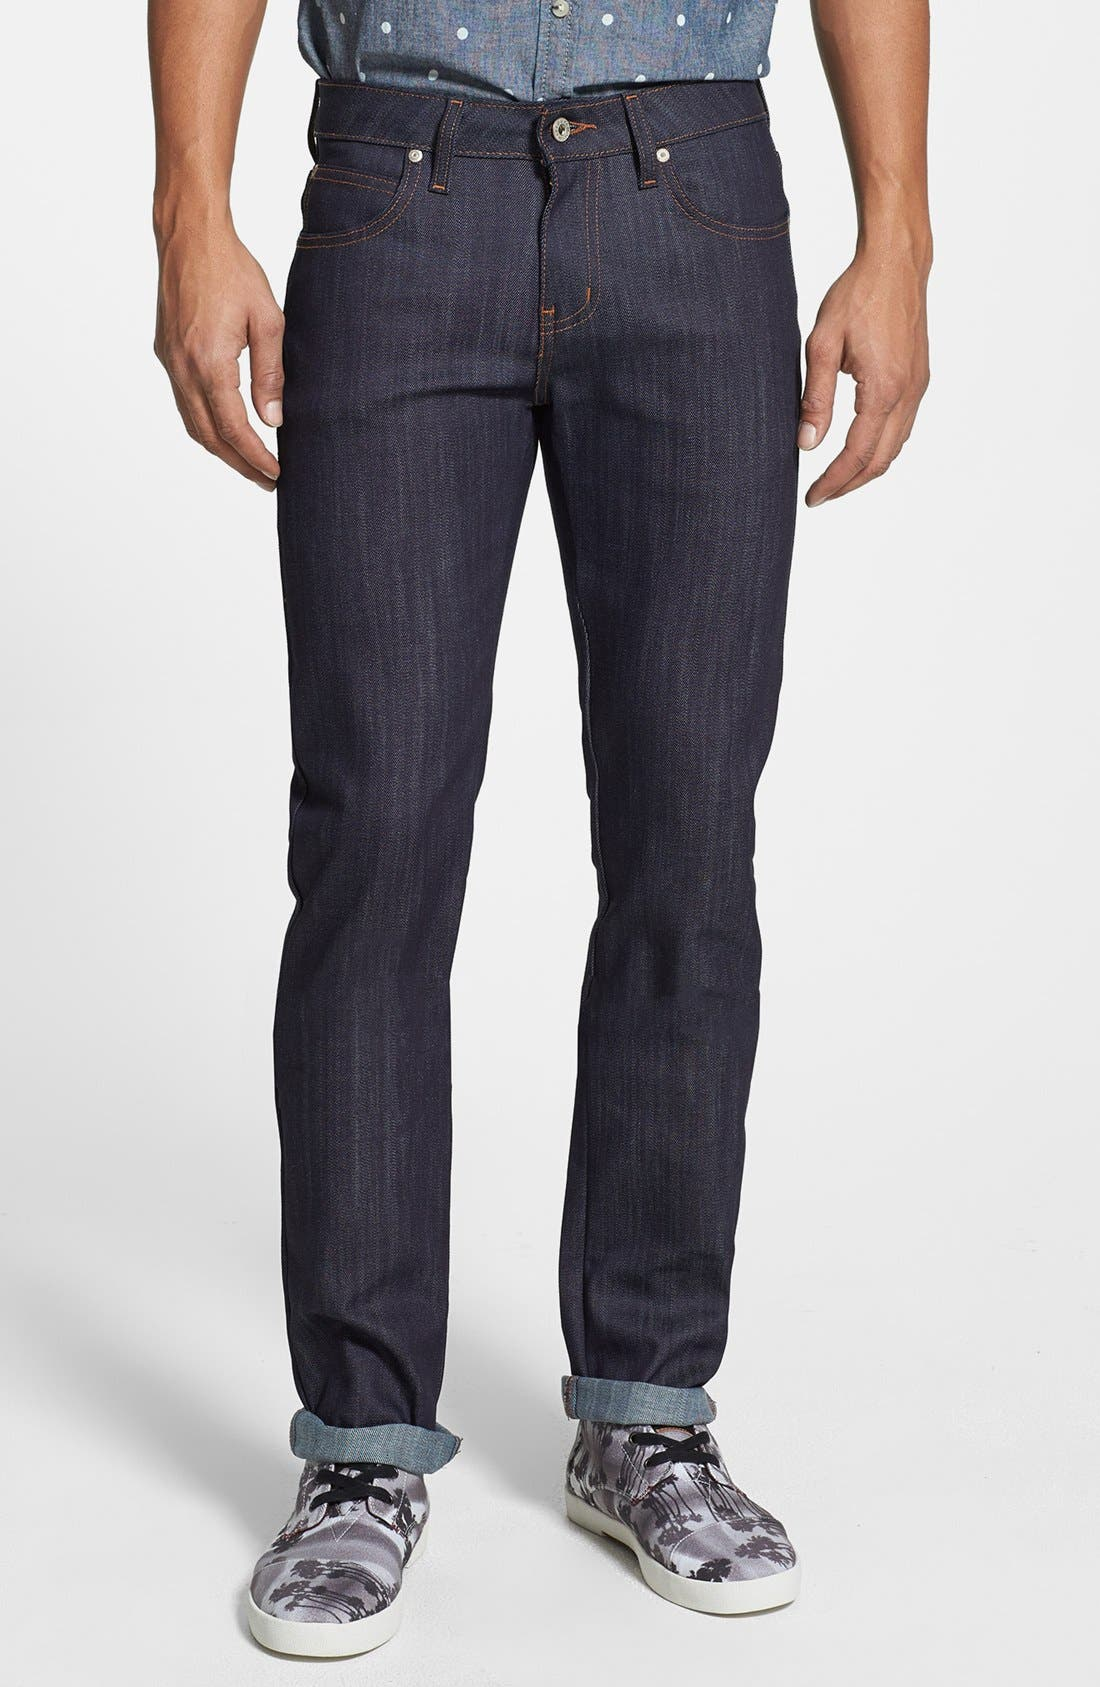 Main Image - Naked & Famous Denim 'Skinny Guy' Skinny Fit Jeans (Indigo Power Stretch)